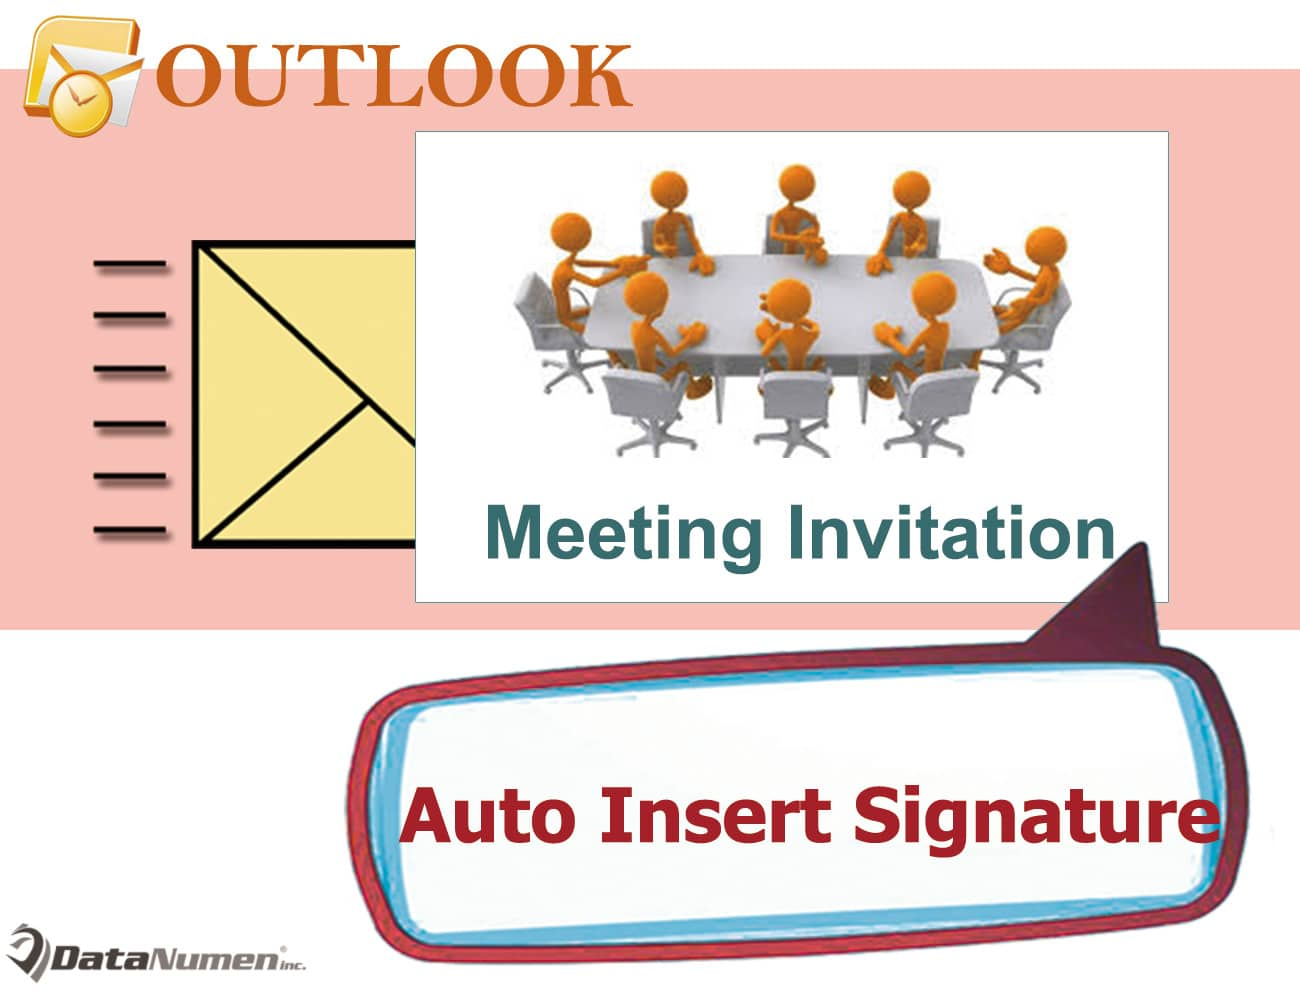 2 Methods to Auto Insert Signature to Meeting Invitations in